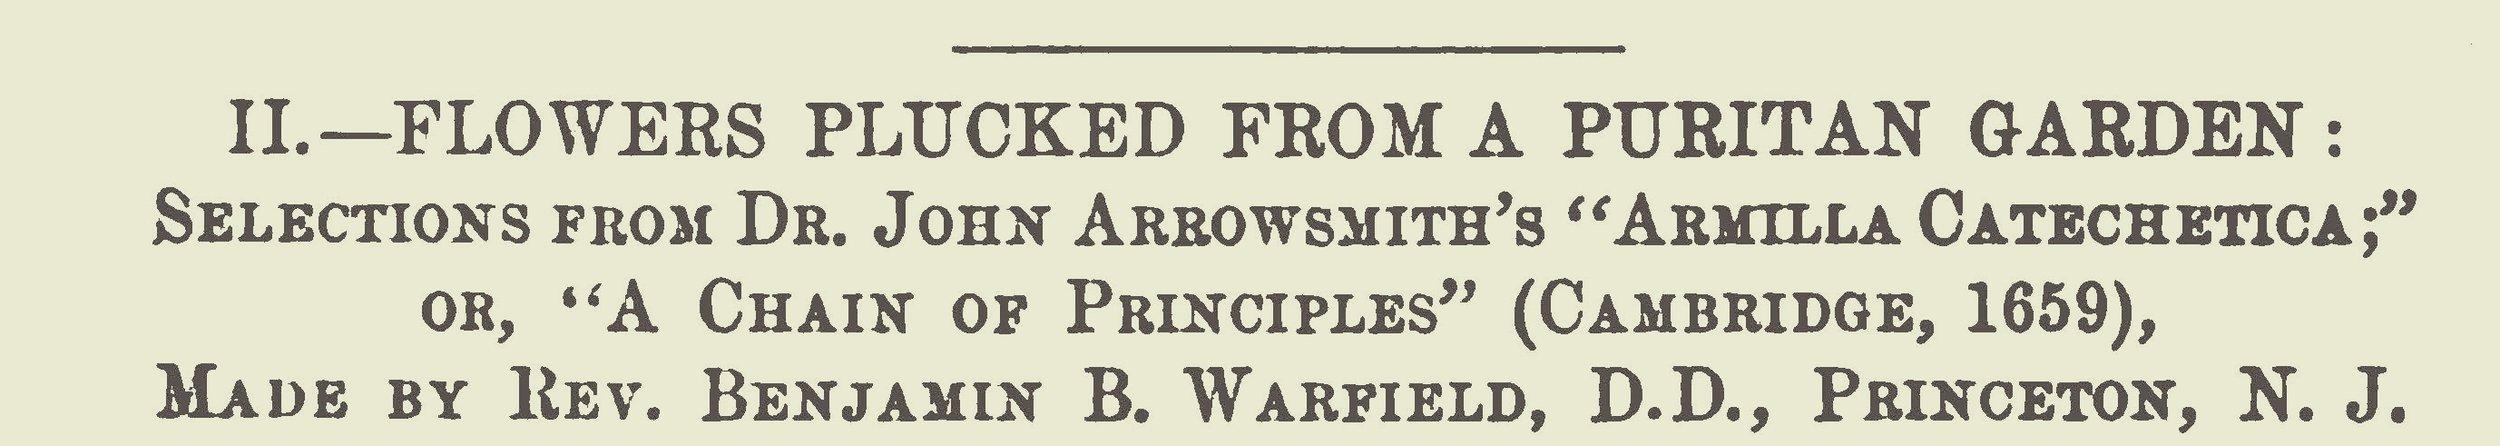 Warfield, Benjamin Breckinridge, Flowers Plucked From a Puritan Garden Title Page.jpg